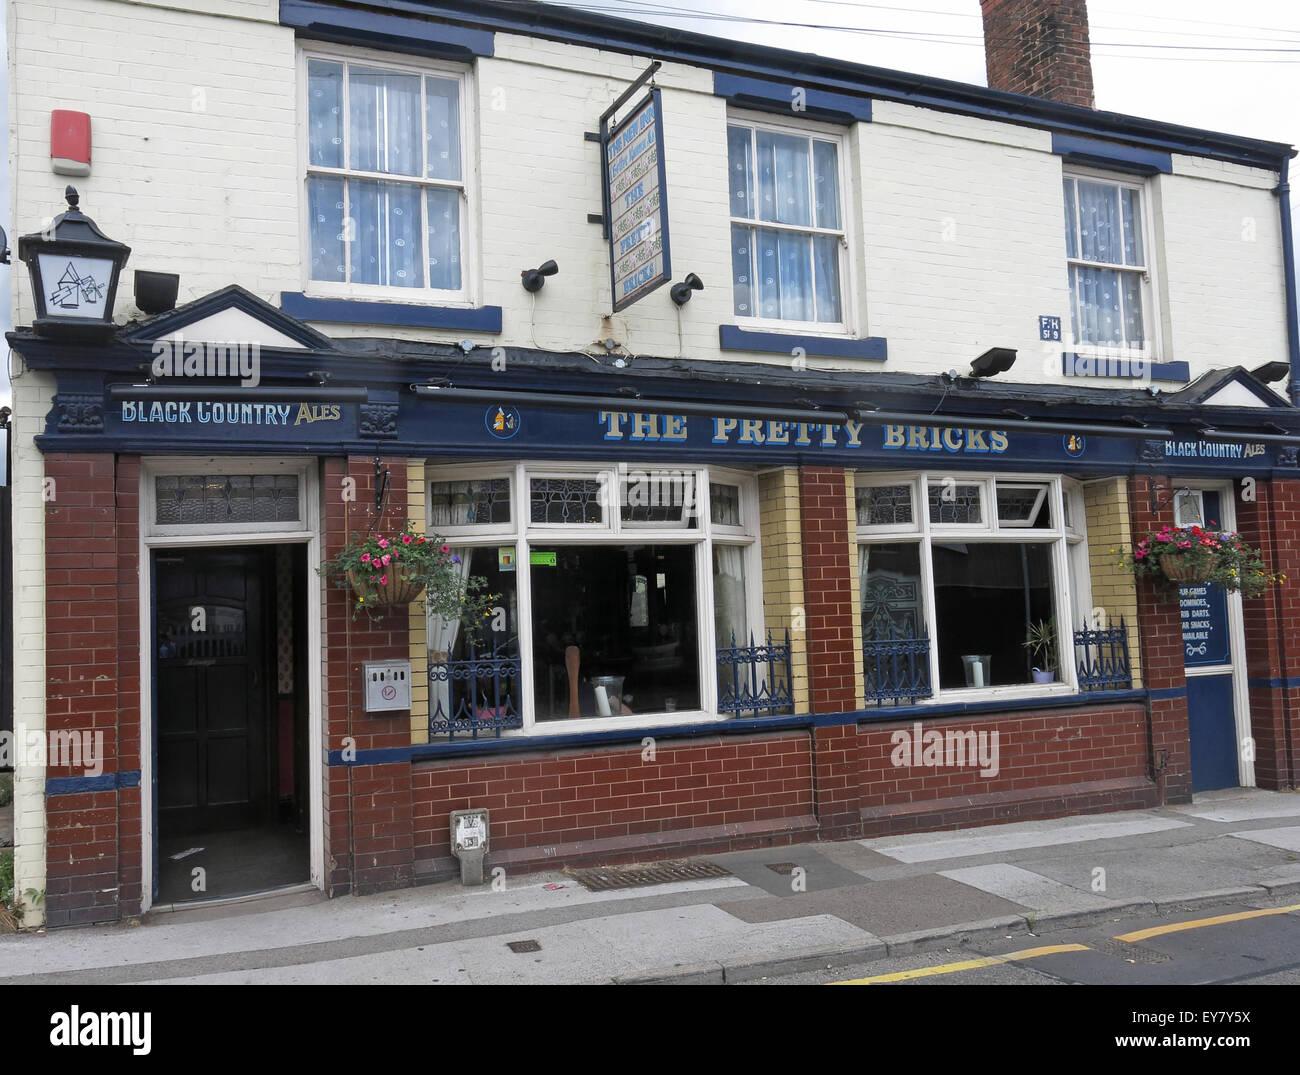 The Pretty Bricks Pub, Walsall, Black Country, West Midlands, England, UK Stock Photo